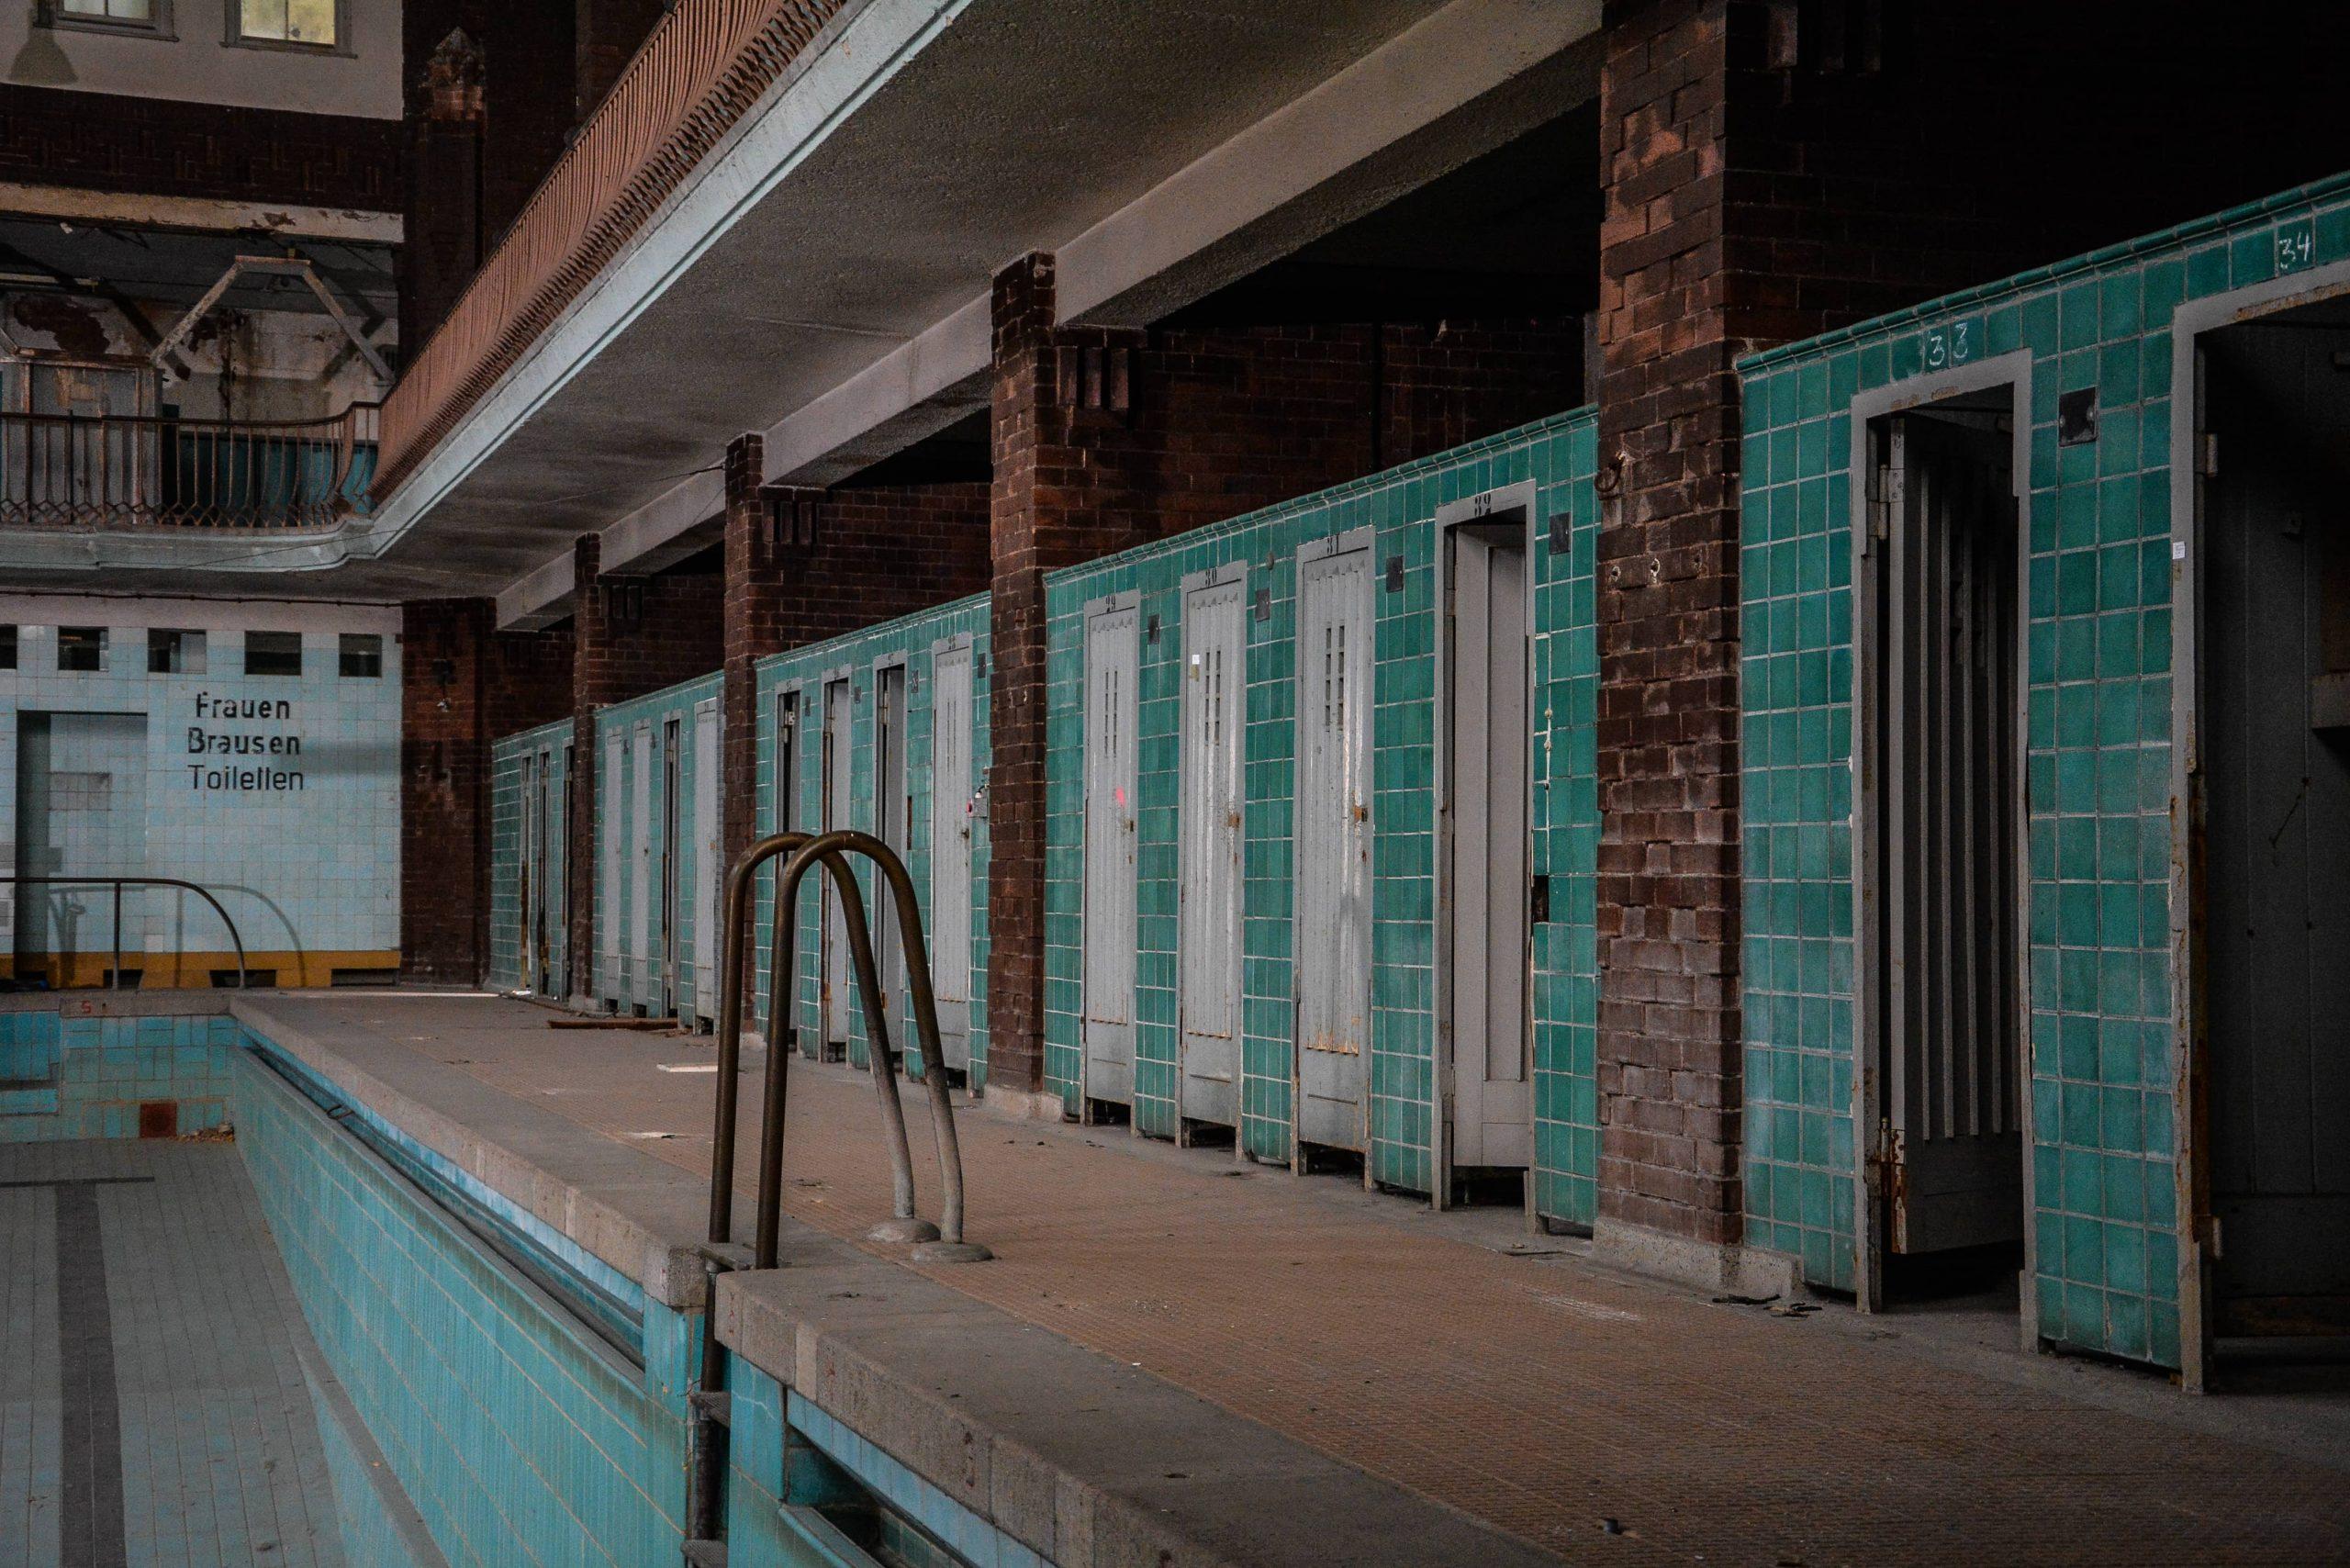 umkleidekabine stadtbad lichtenberg hubertusbad berlin abandoned pool urbex lost places